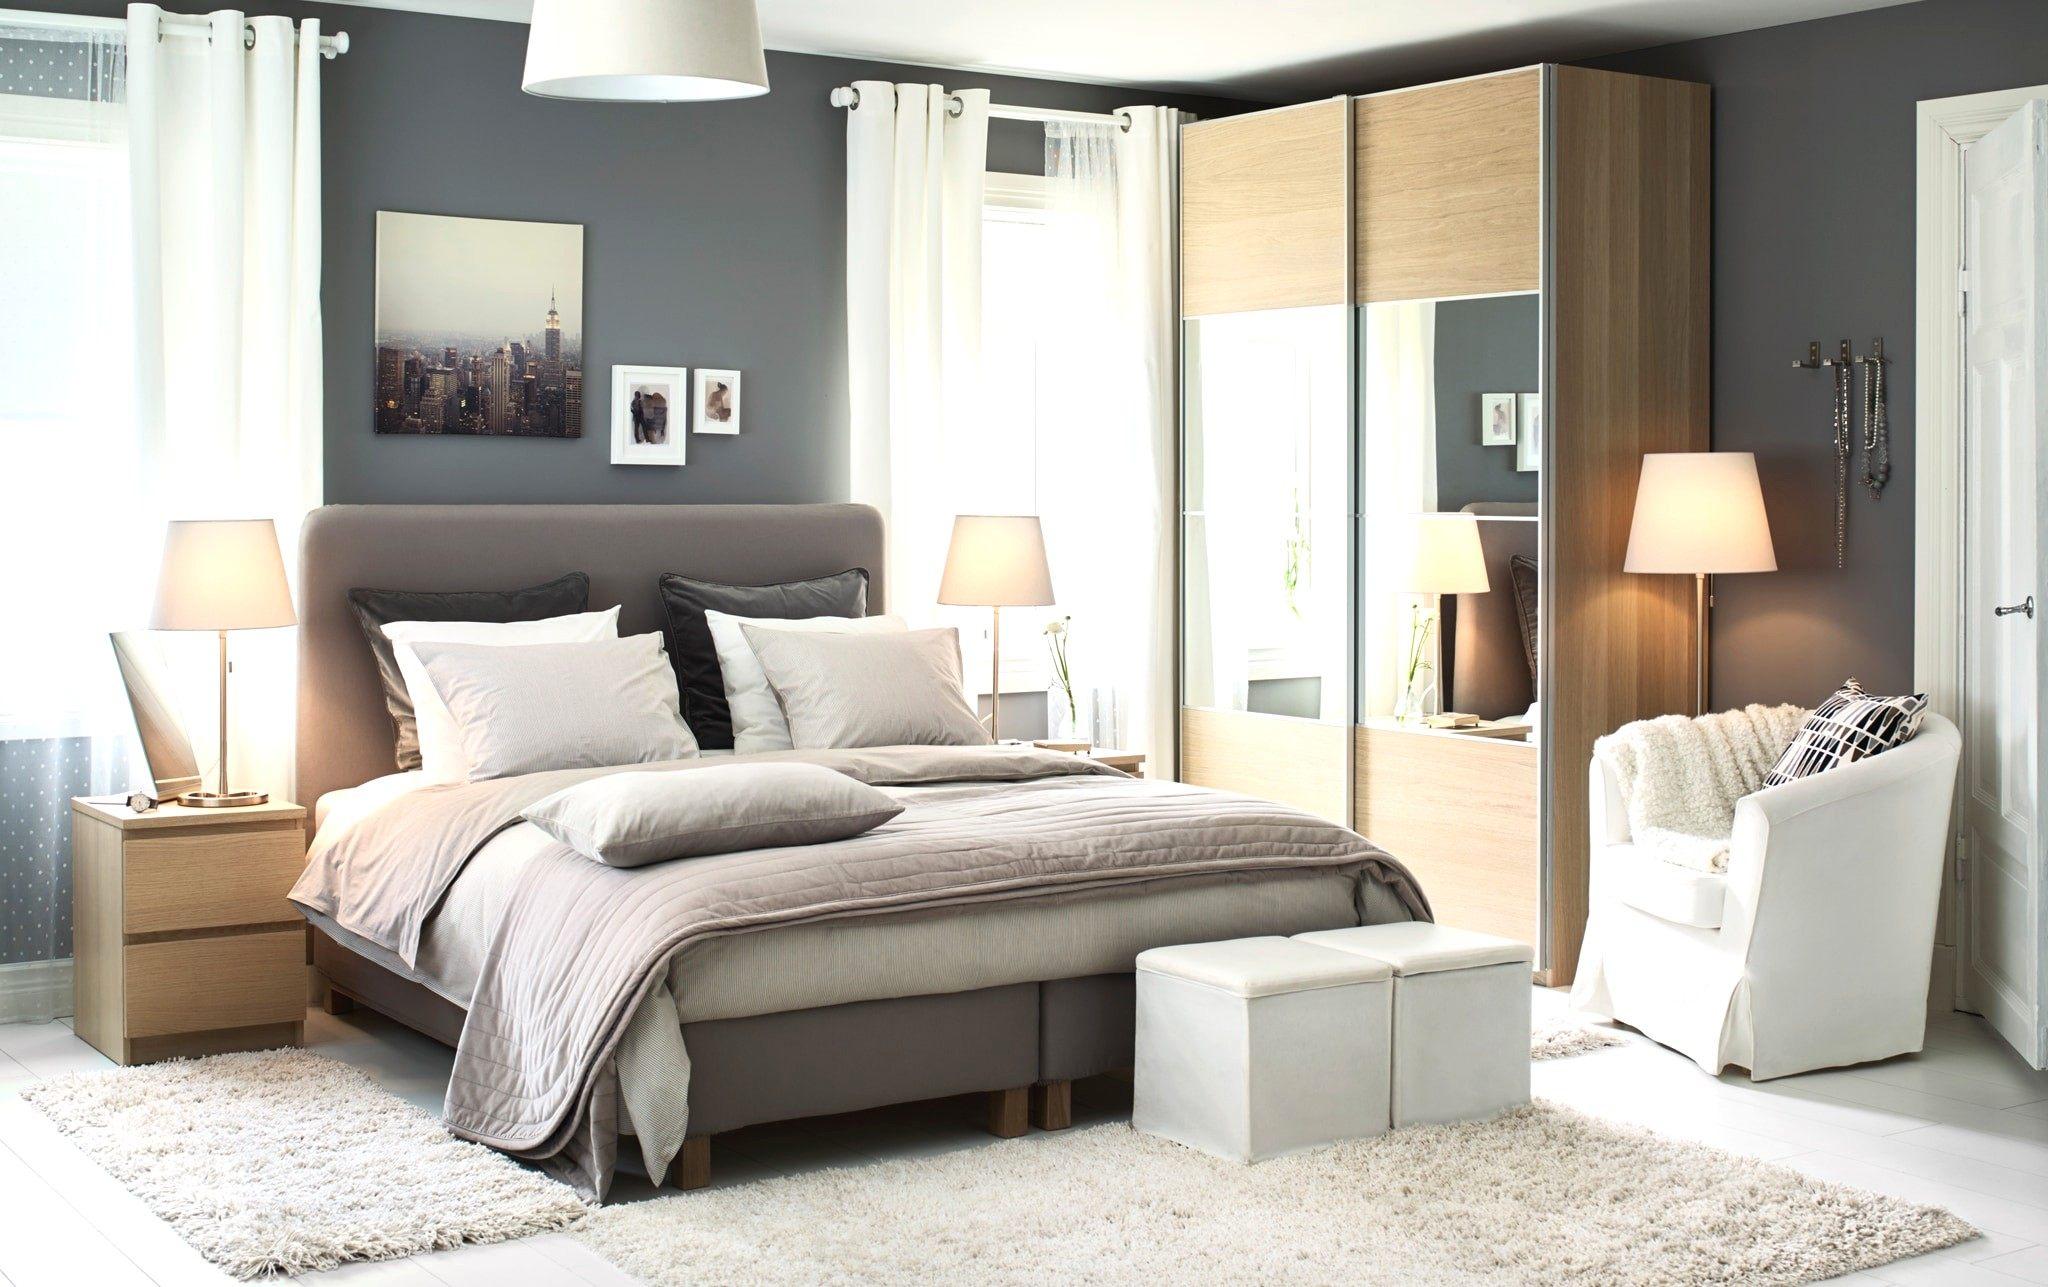 Lits Superposés 80×190 Inspiré Chambre Coucher Ikea Avec Ikea Confort Supr C3 Aame Prix Extr C3